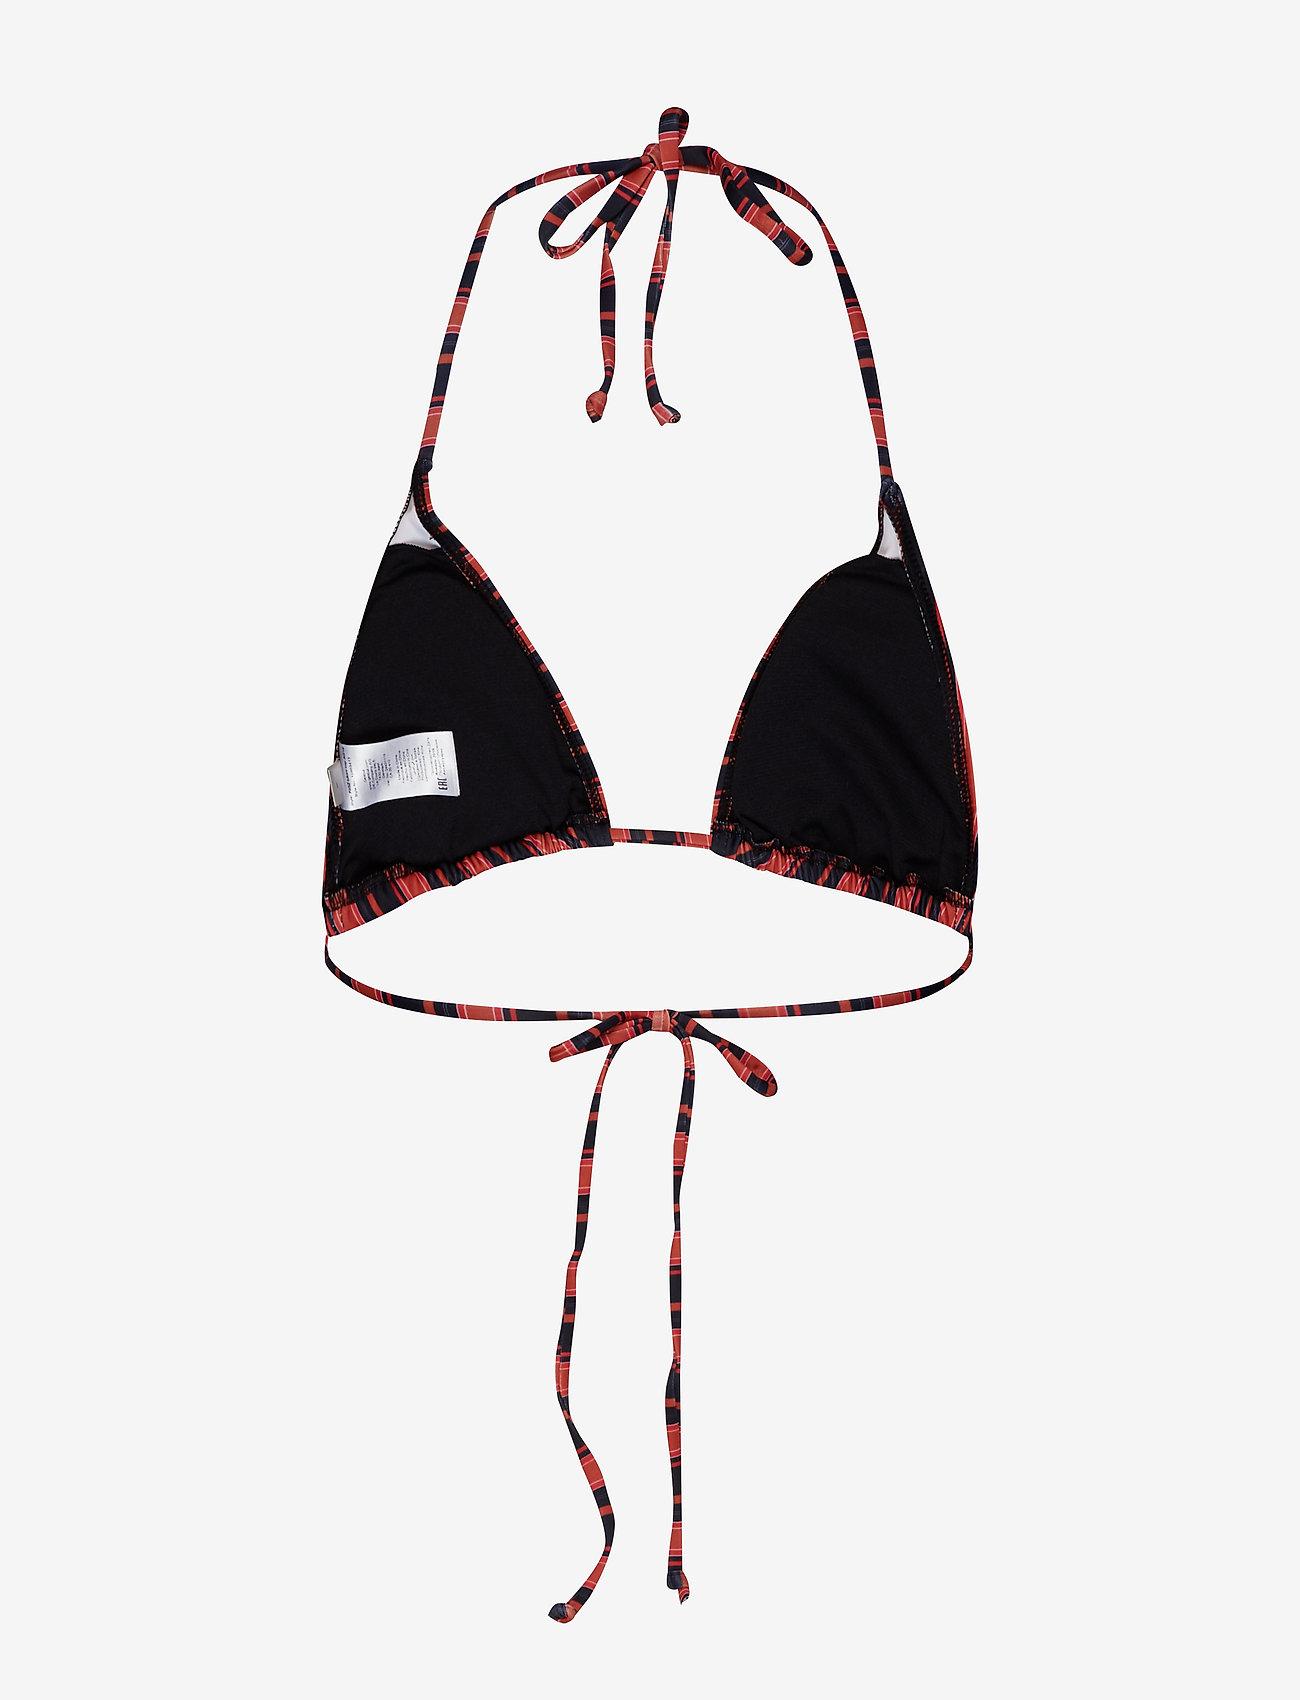 Gestuz PilGZ bikini top AO19- Maillots de bain ff9FNxlA 3eVCx D1b0oZ7m